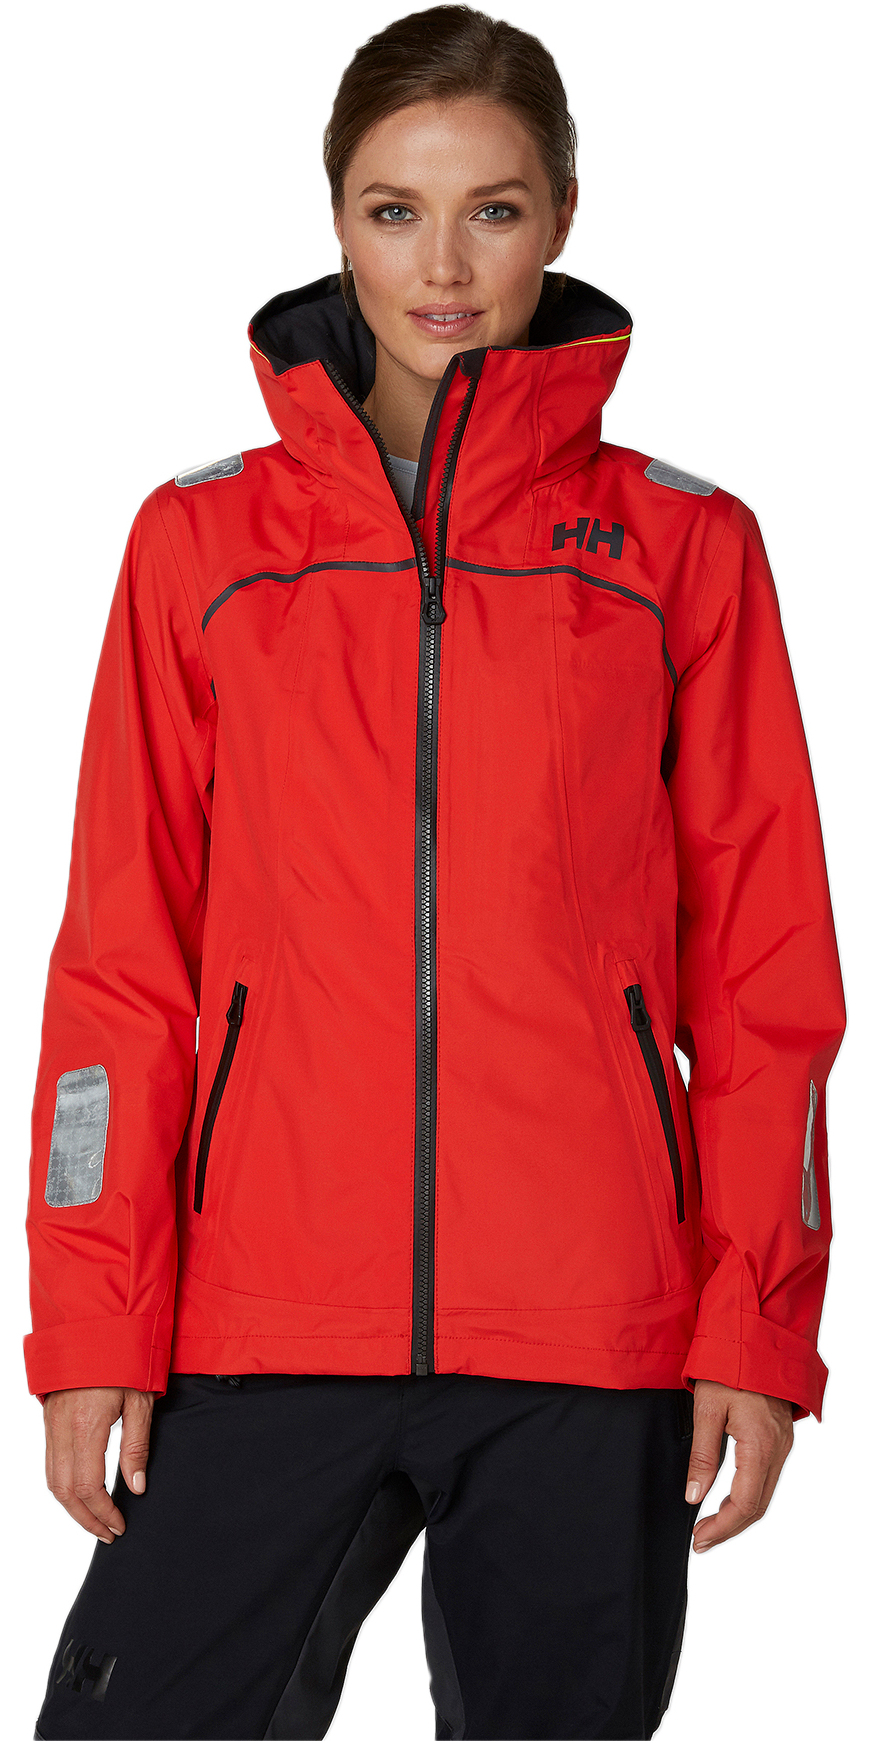 e5187c5034 Helly Hansen Womens Jacket HP Foil 33887 | Sailing | Yacht | Wetsuitoutlet  | Wetsuit Outlet